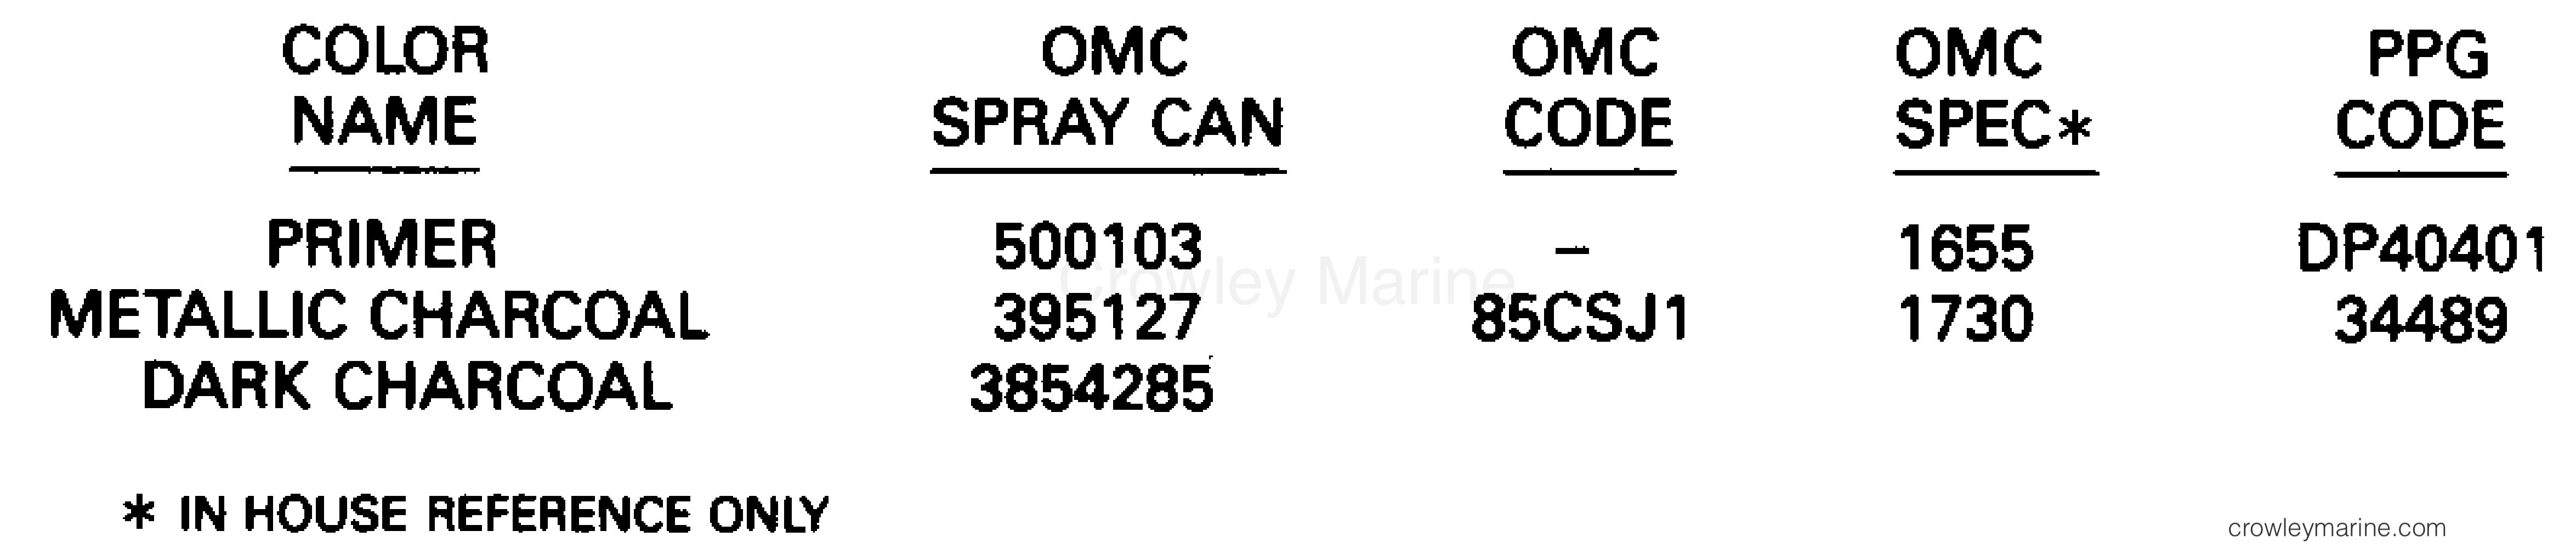 1994 OMC Stern Drive 5.7 - 572AGPMDA - PAINT